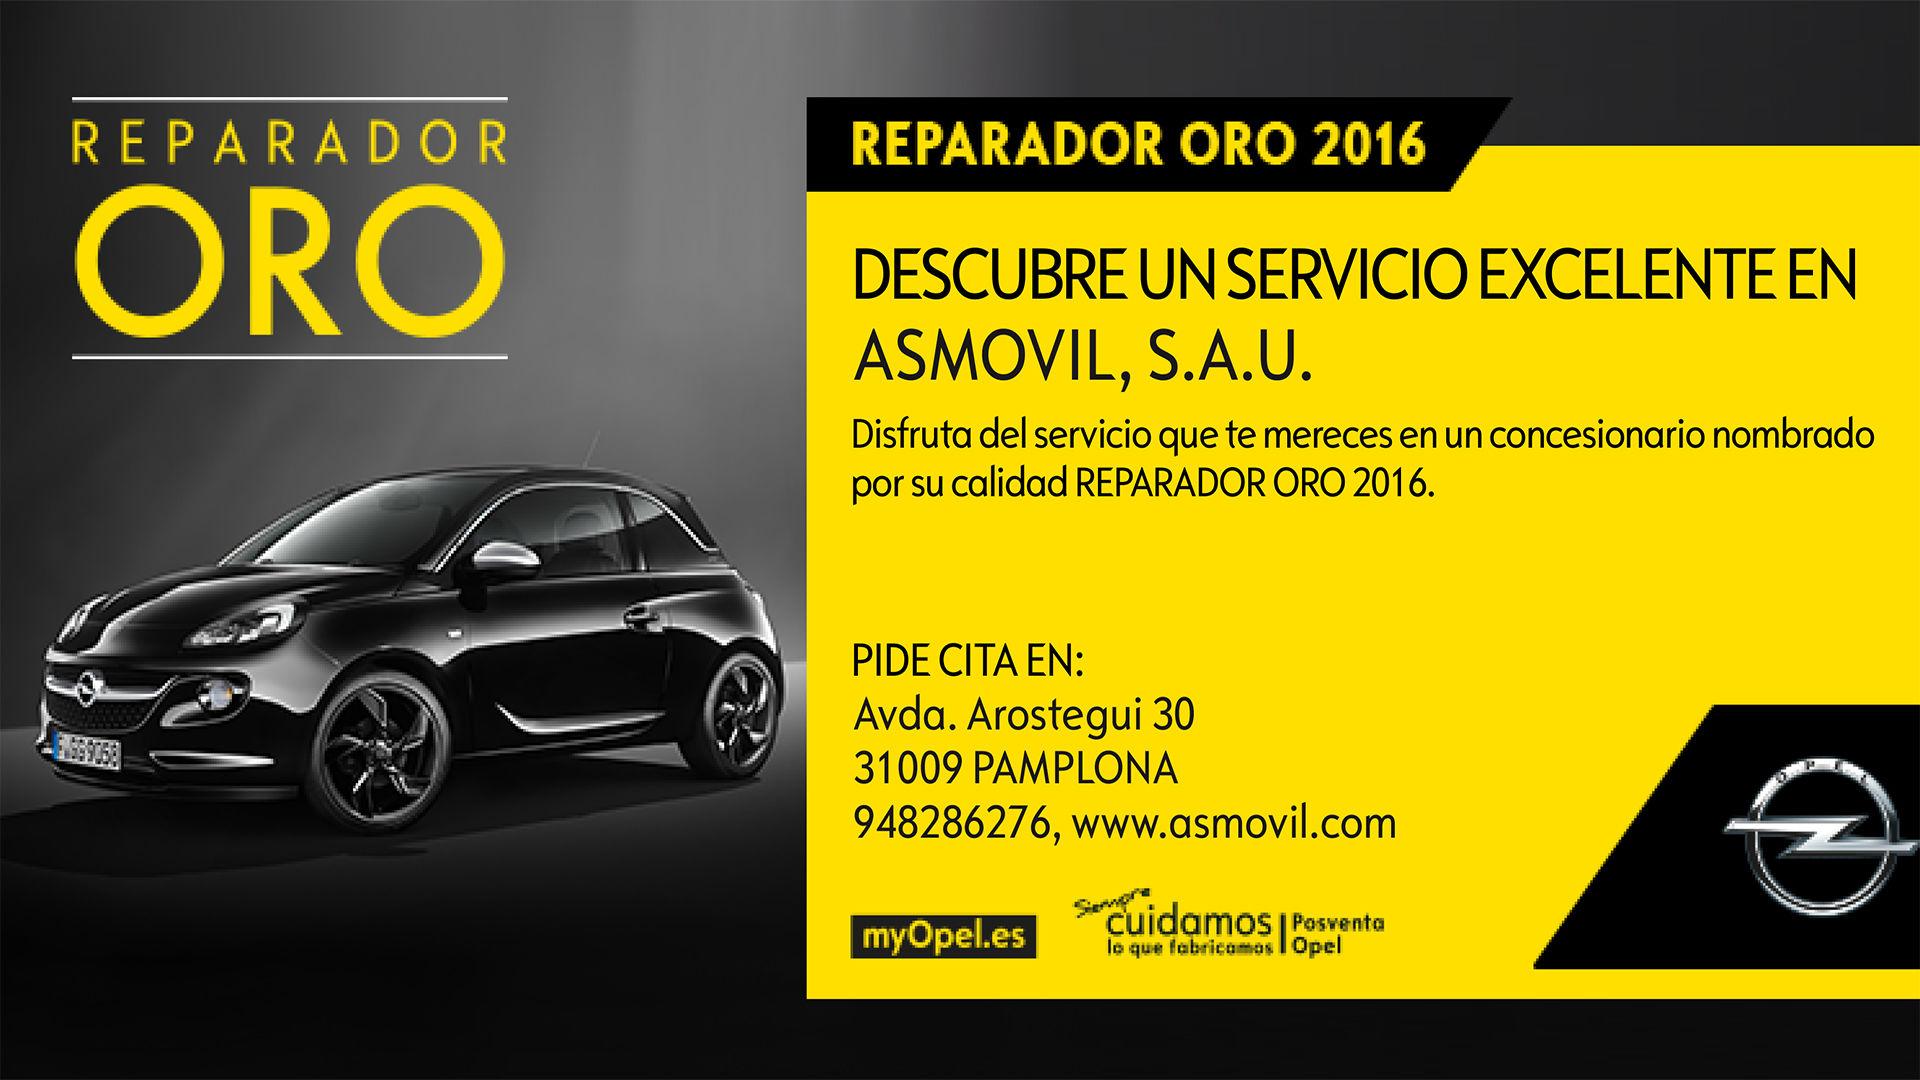 ASMÓVIL - REPARADOR ORO 2016